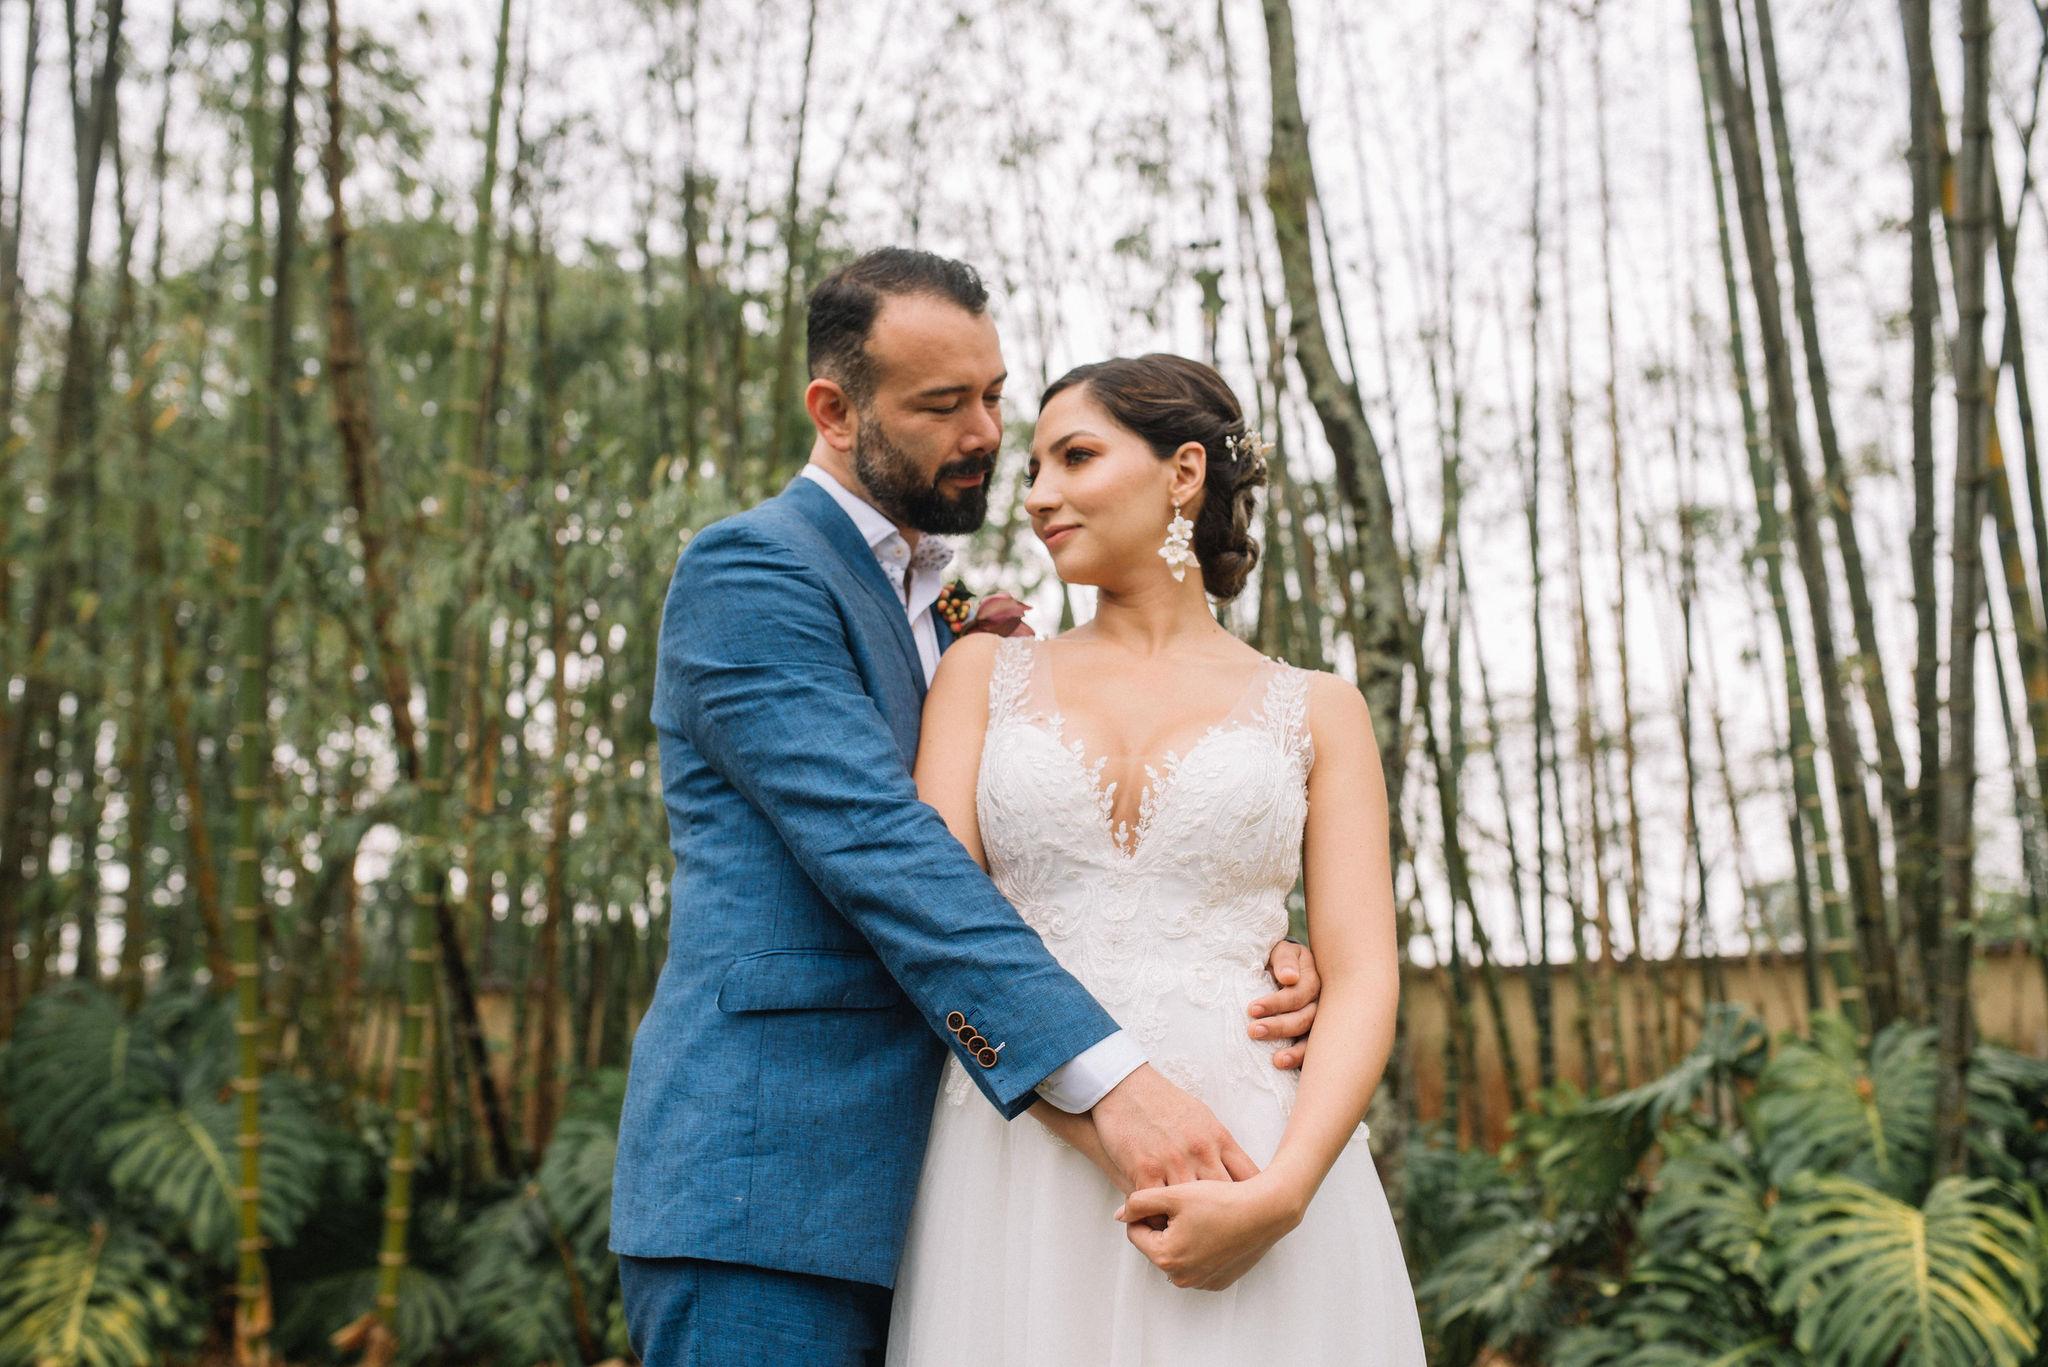 julieth-bravo=weddingplanner-saidmoda-catalinabayona-vestido-novio-traje-matrimonio-destinationwedding.jpg